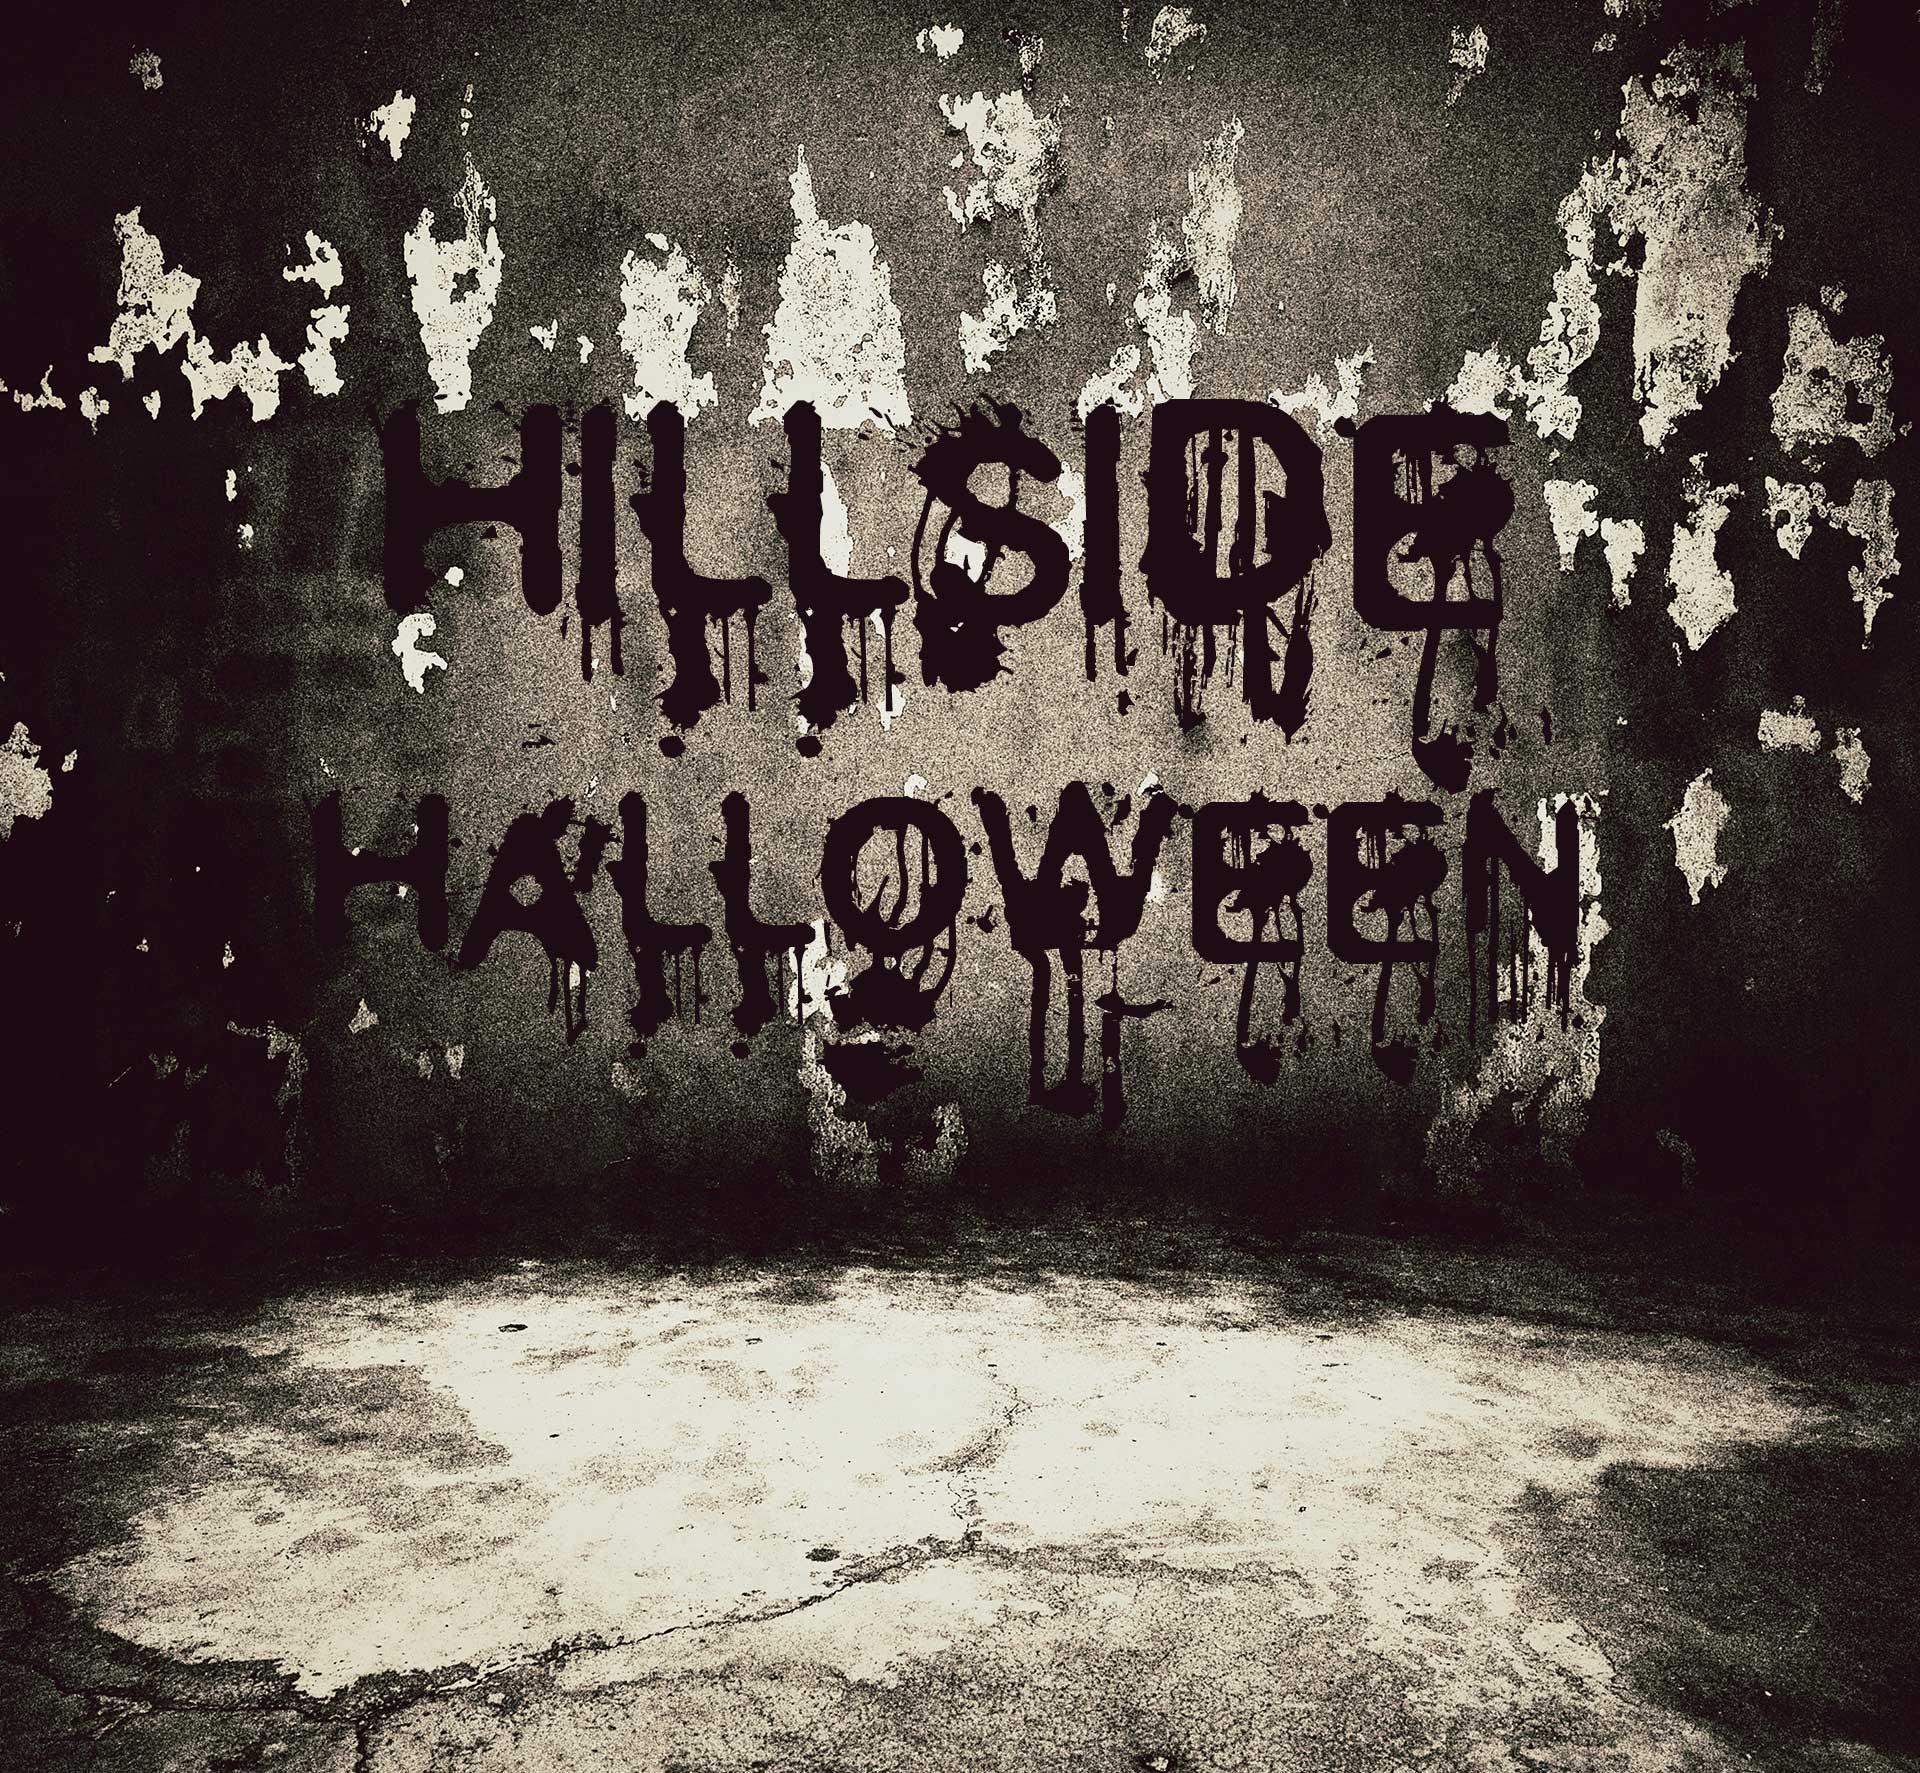 Hillside Halloween